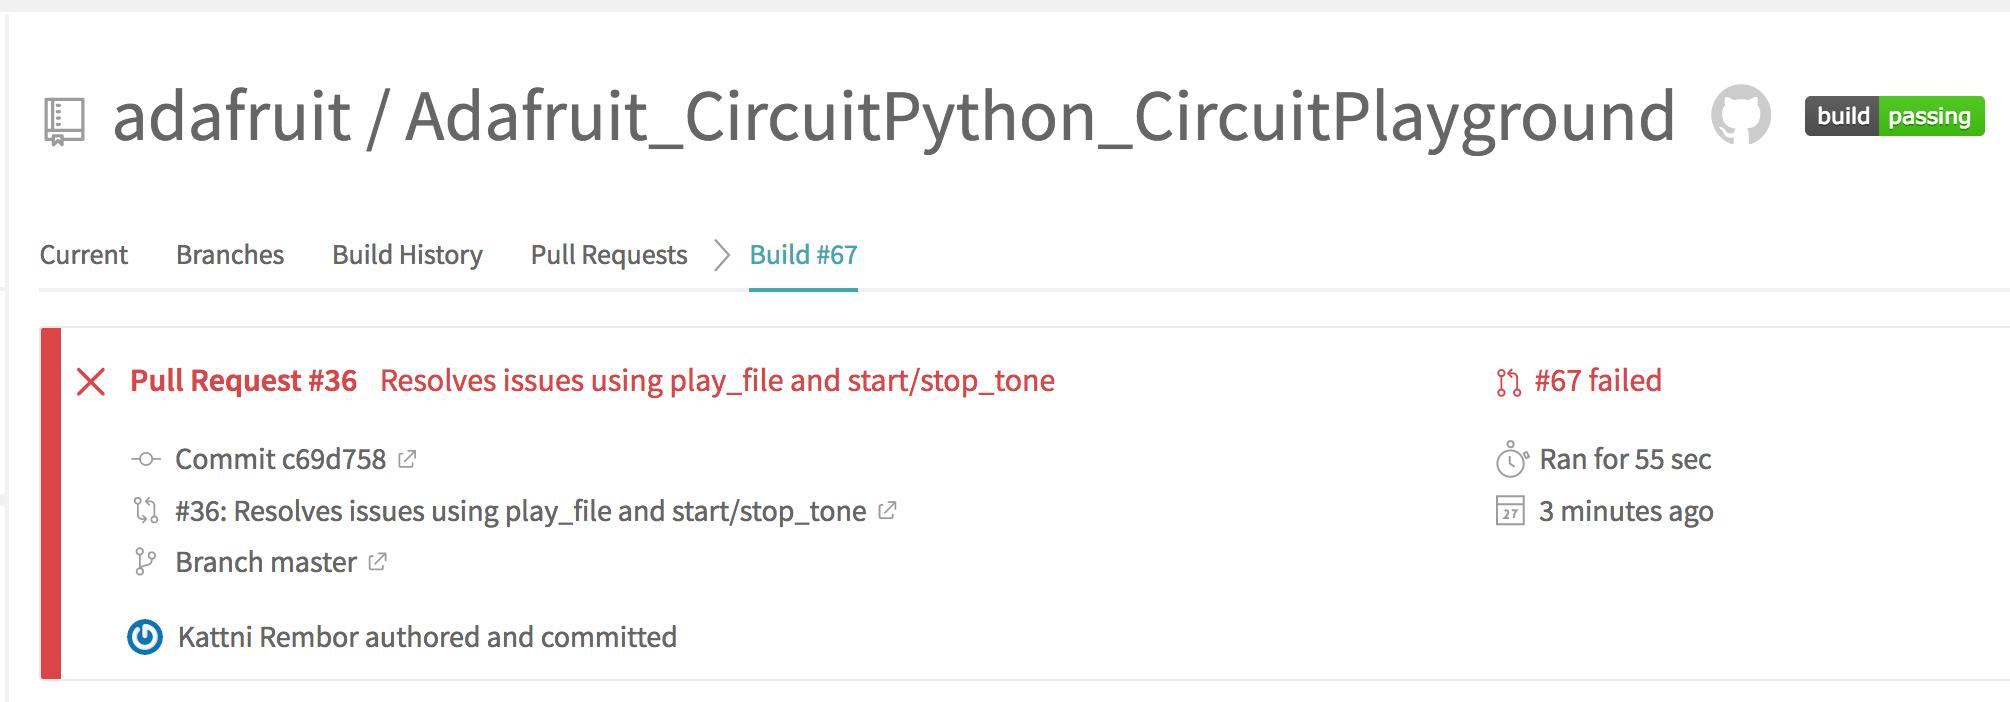 circuitpython_GitHubOpenPRTravisHeader.png